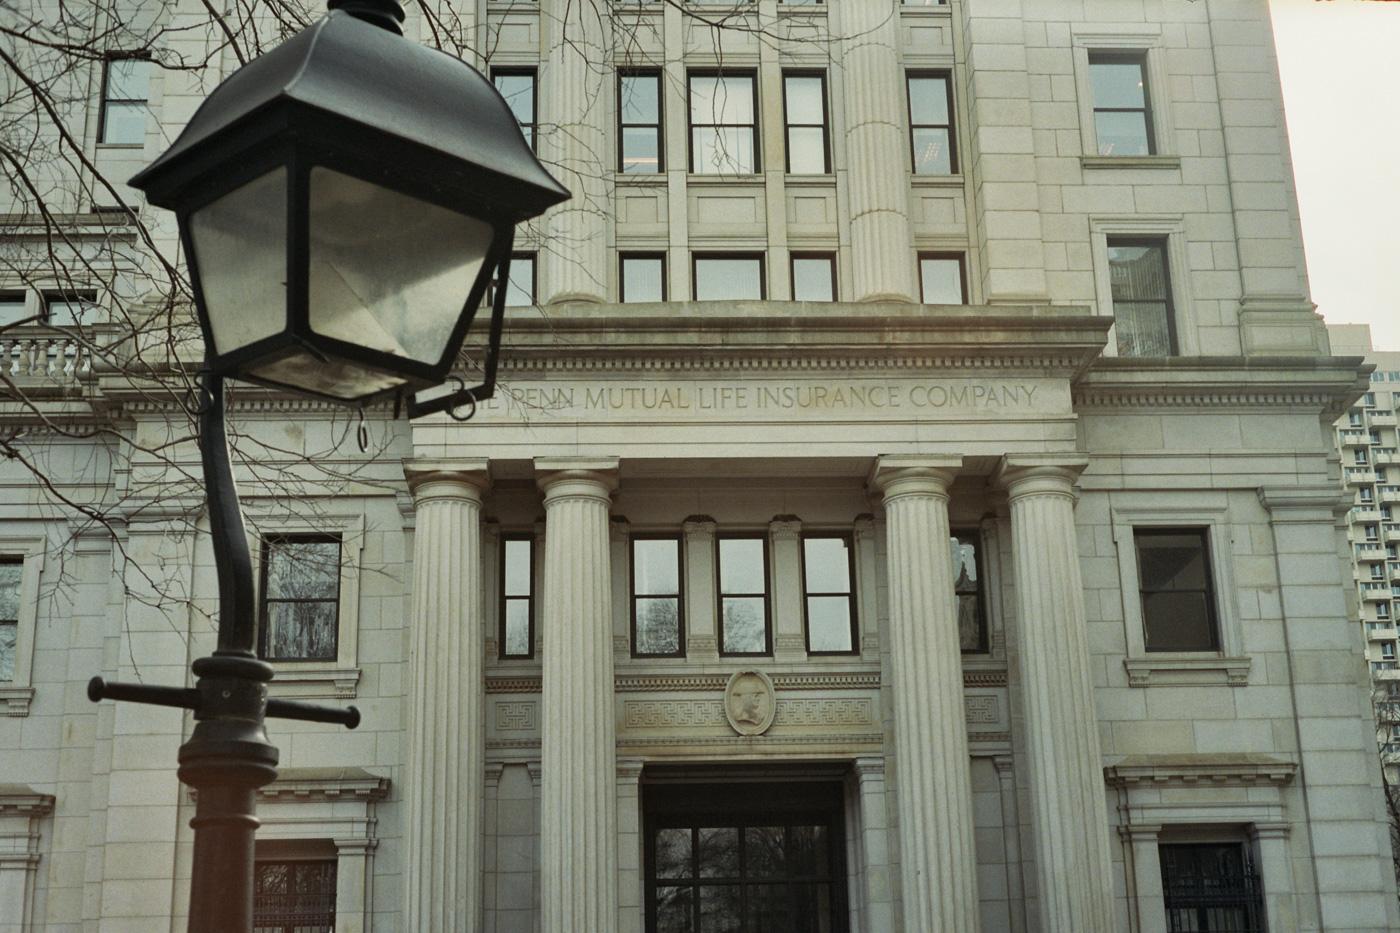 The Penn Mutual Life Insurance Company